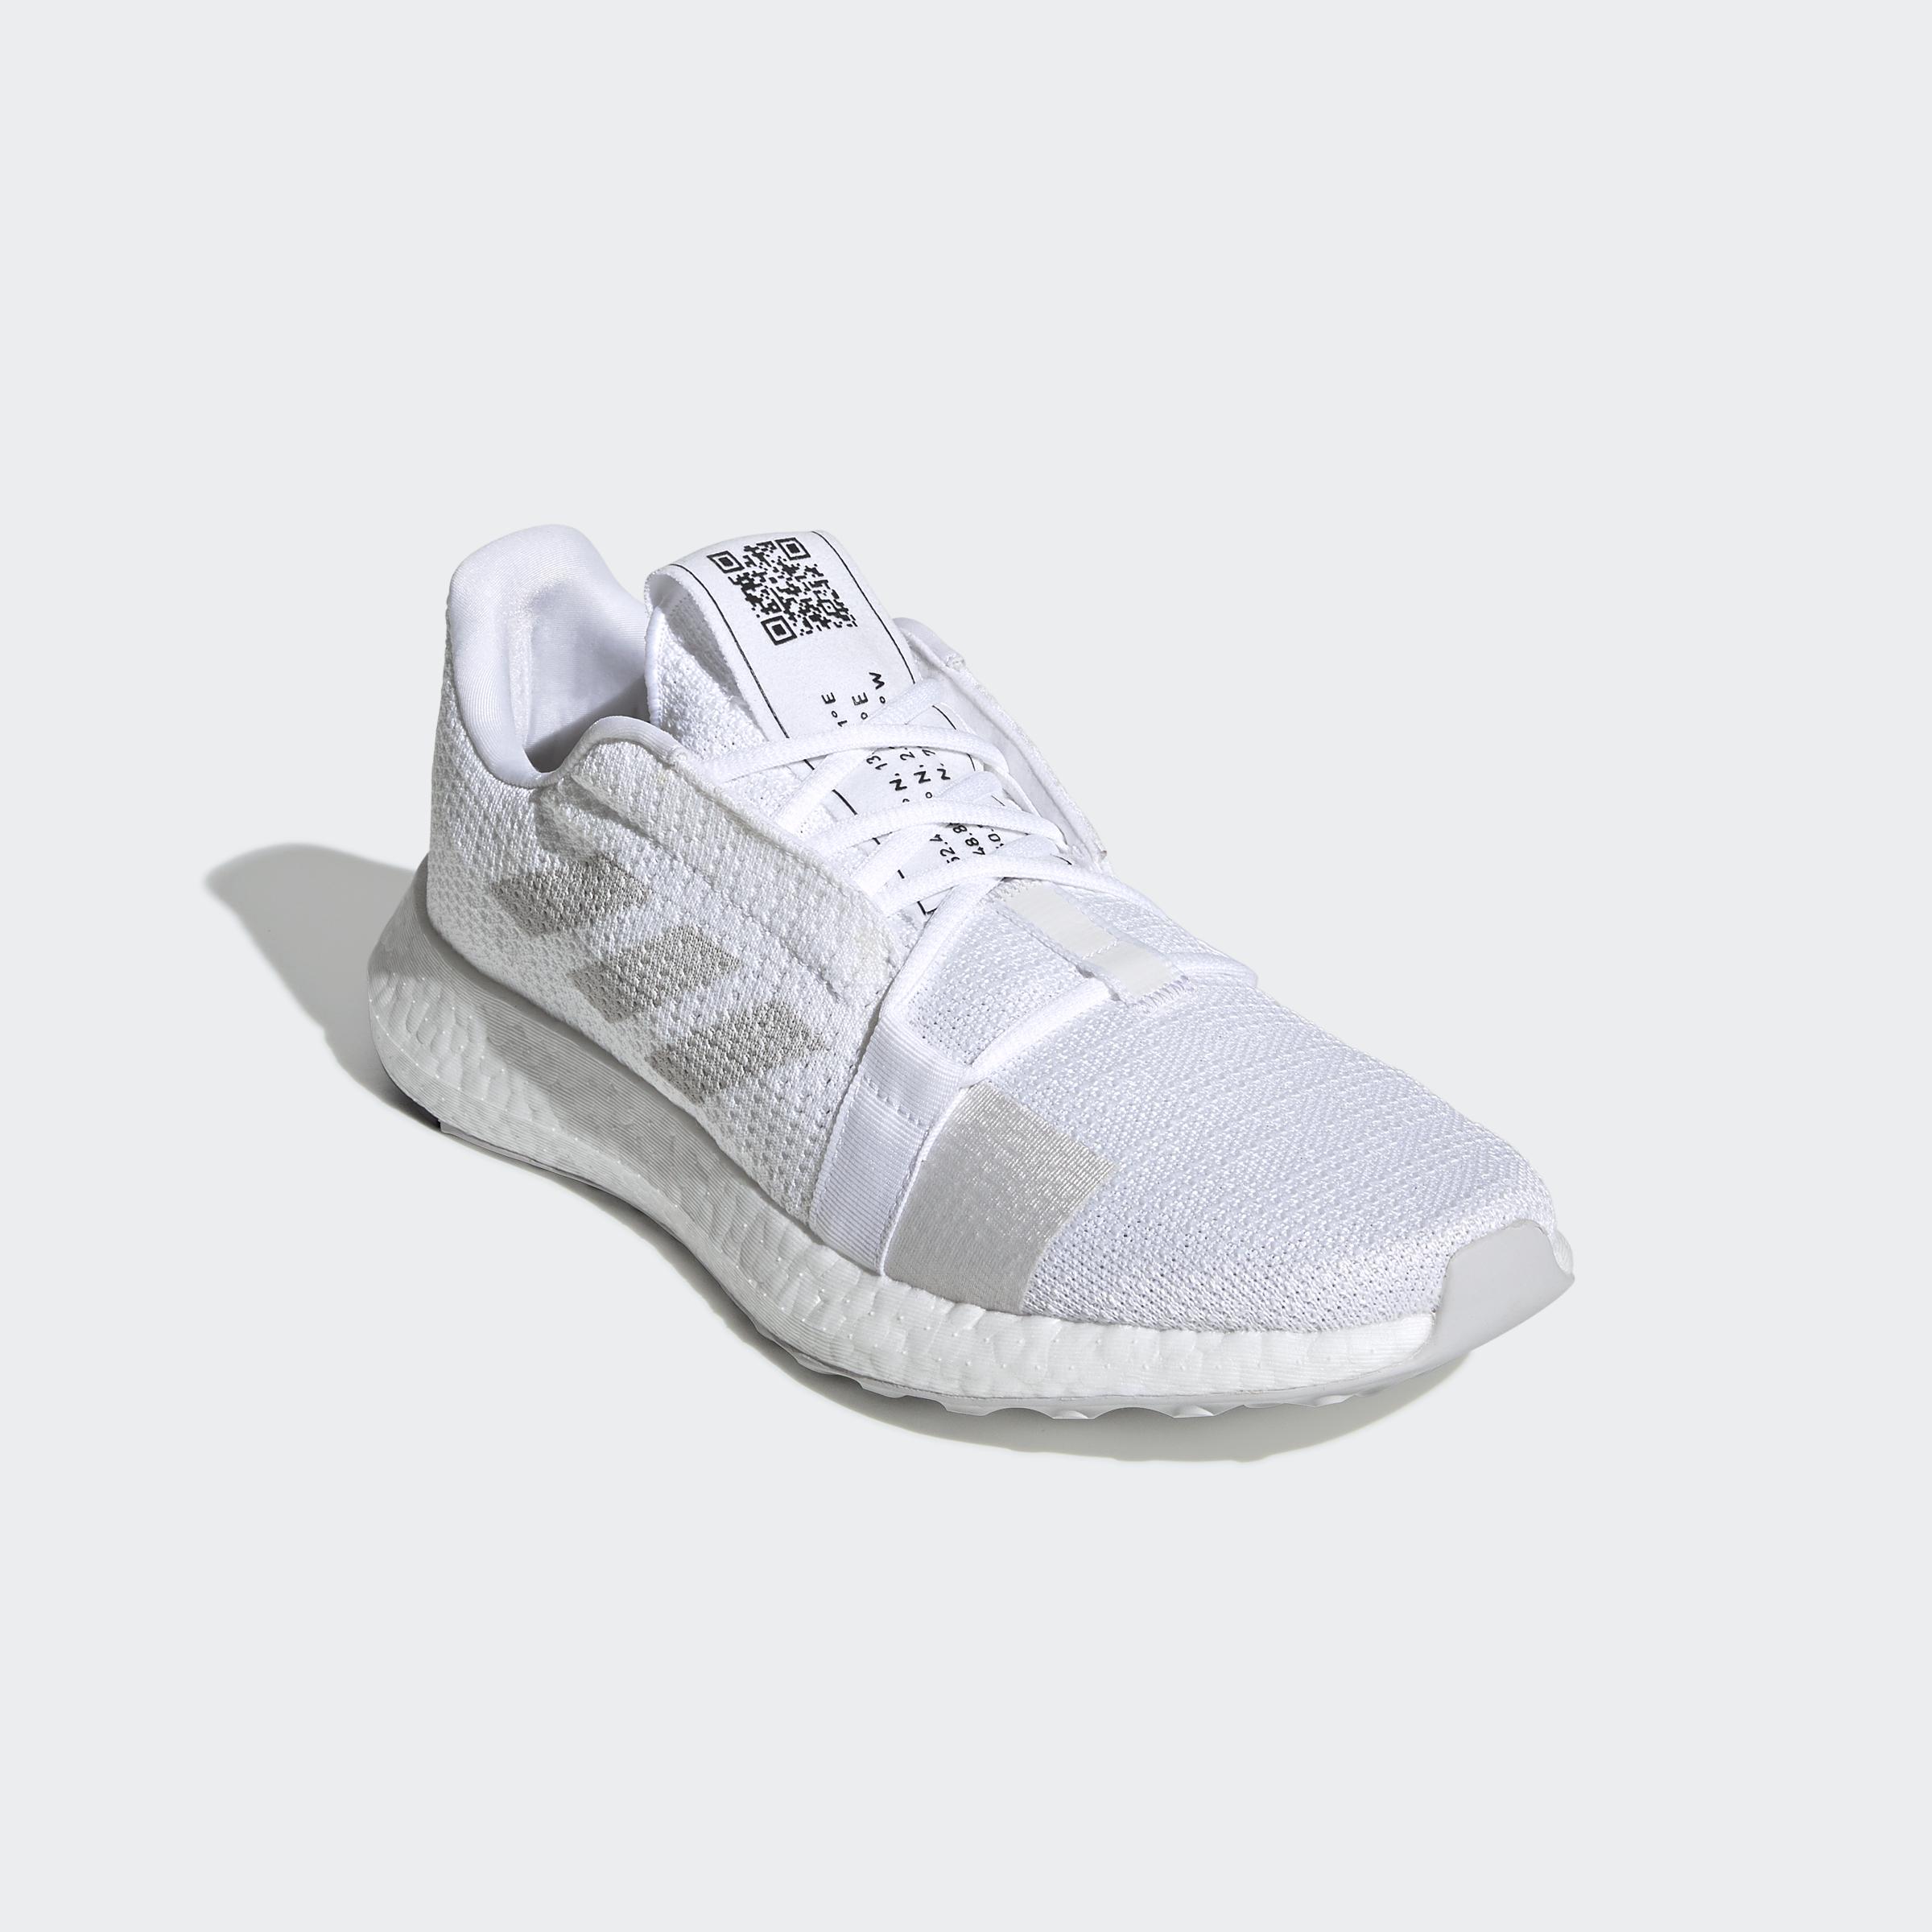 miniature 33 - adidas Senseboost Go Shoes Men's Athletic & Sneakers